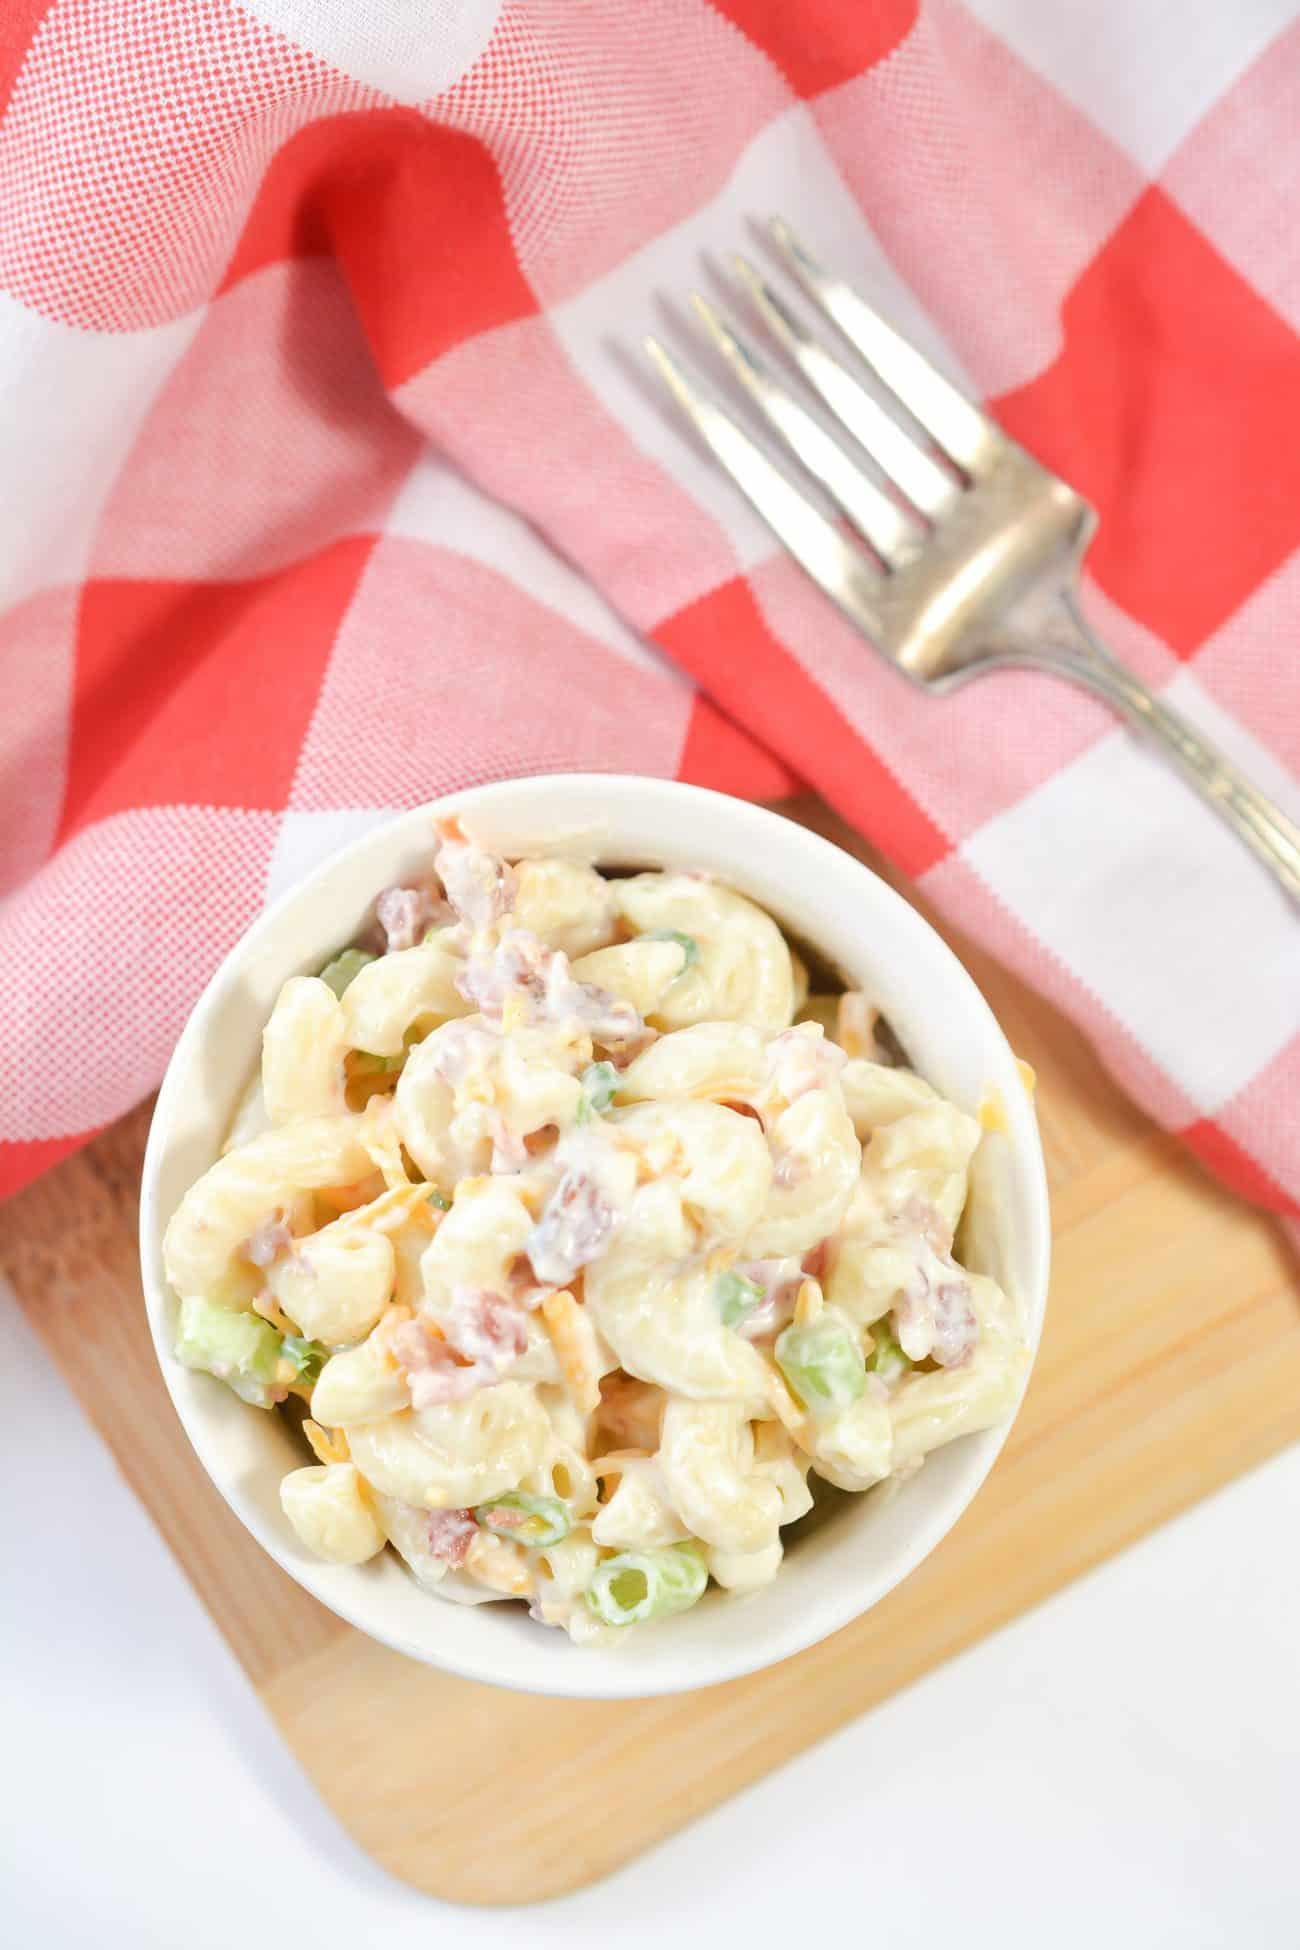 Bacon, Lettuce and Tomato Macaroni Salad